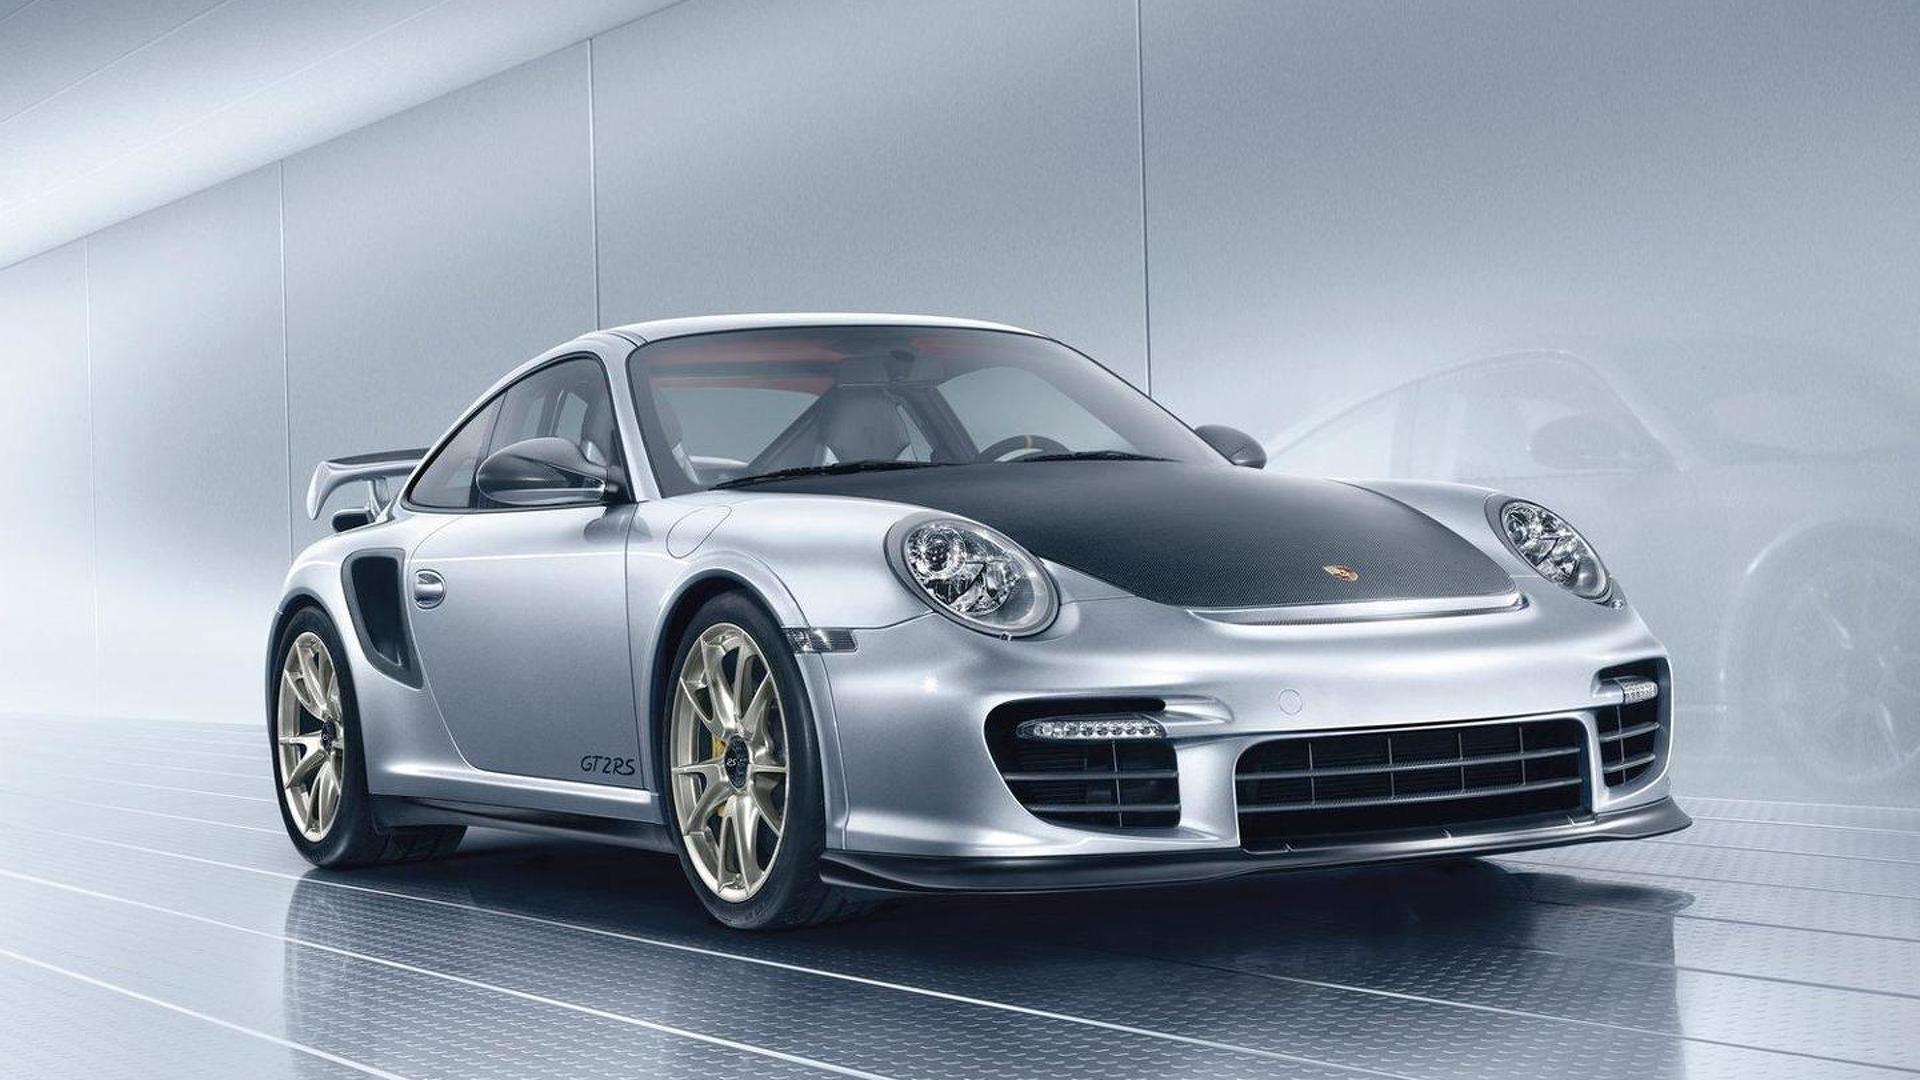 2010-201368-2011-porsche-911-gt2-rs-first-official-photos-12-05-20101 Astounding Porsche 911 Gt2 for Sale Canada Cars Trend